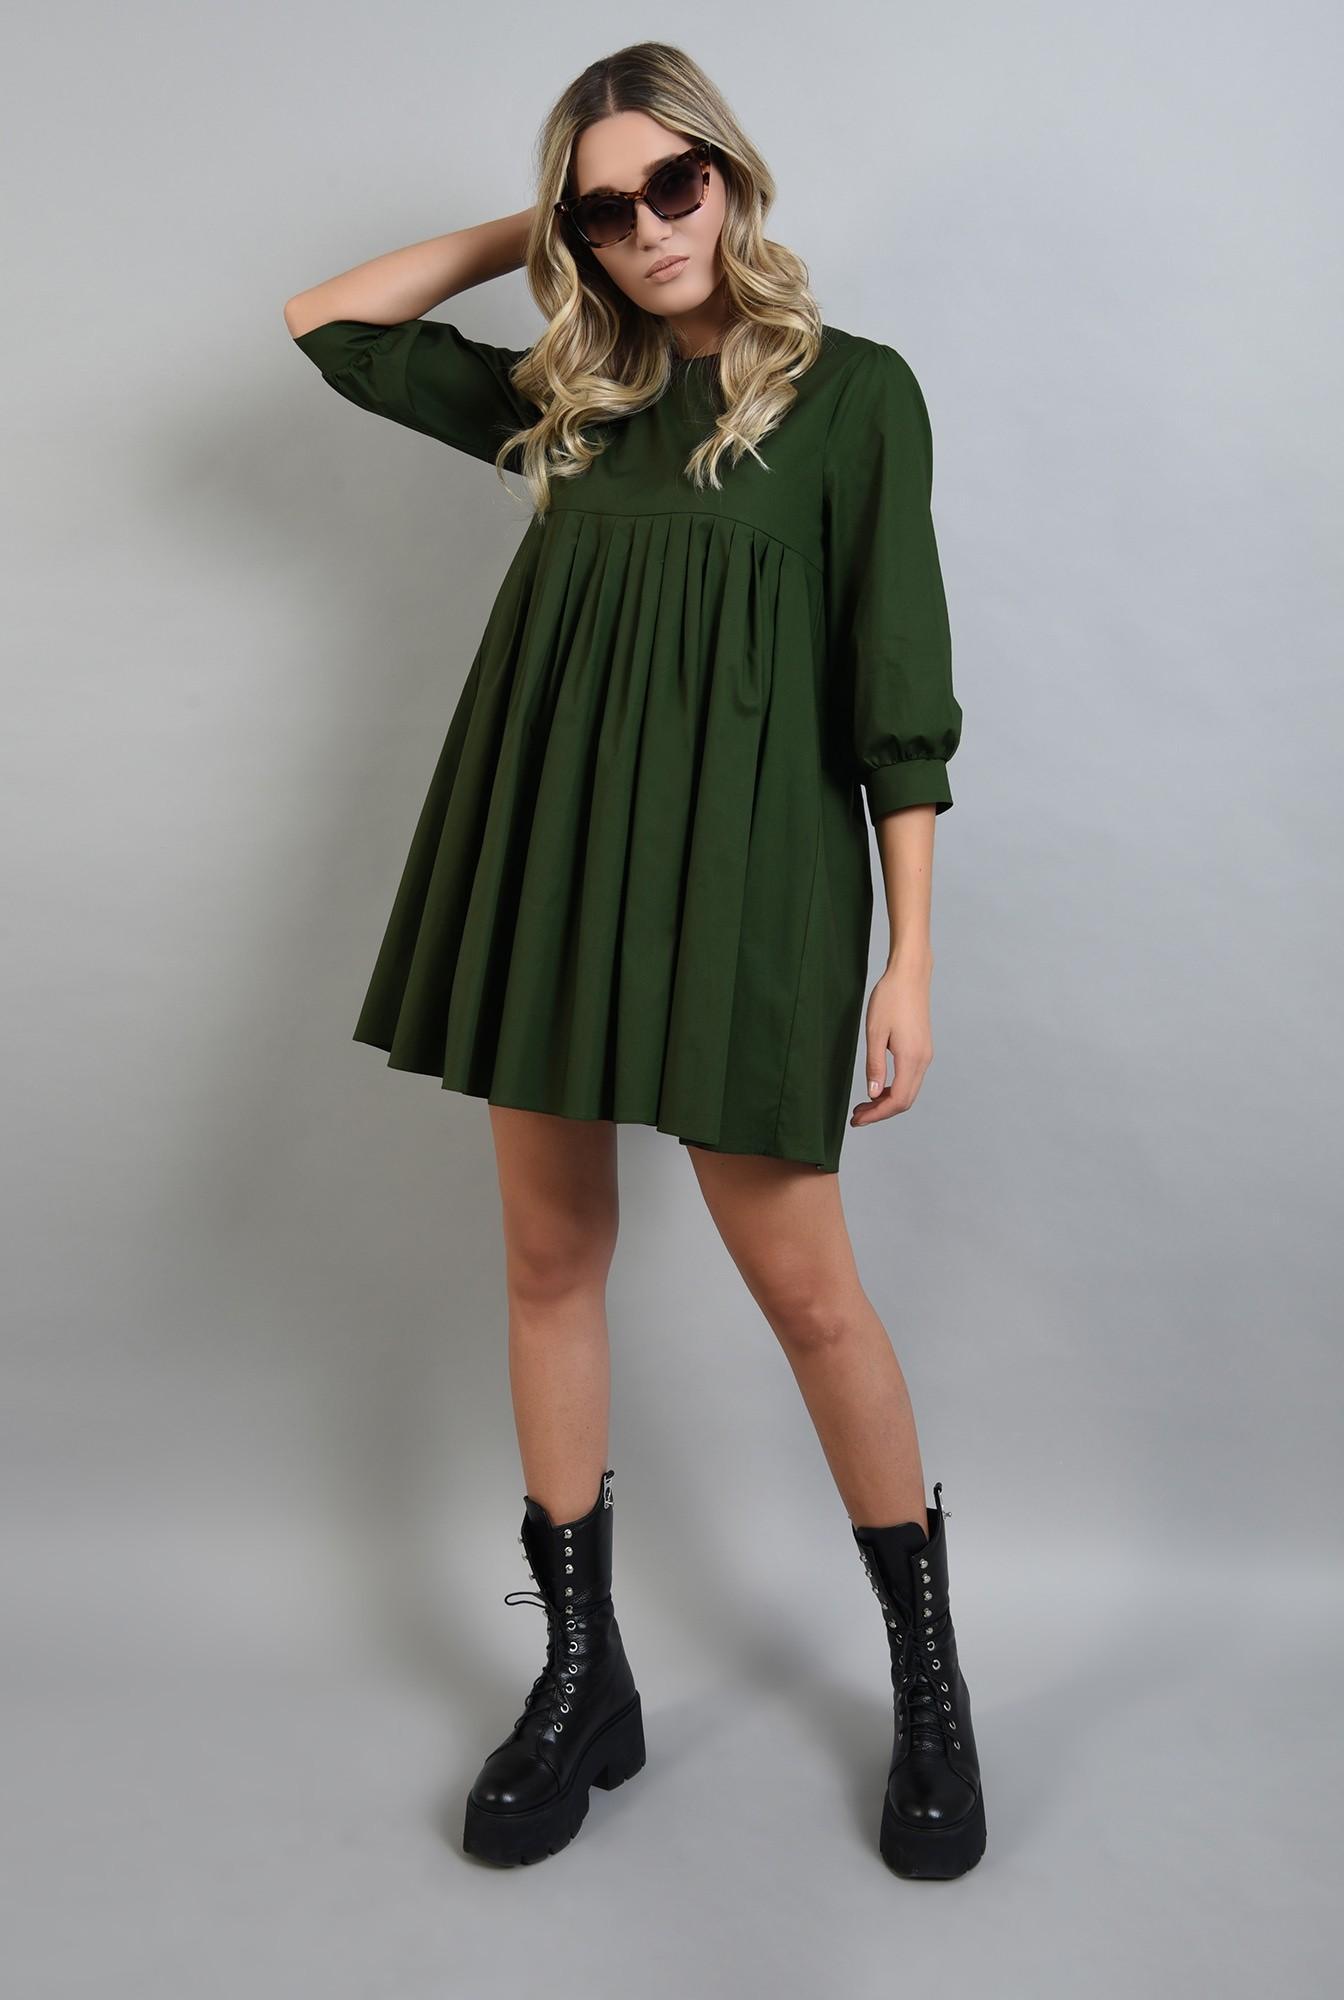 0 - rochie verde scurta, cu pliuri, Poema